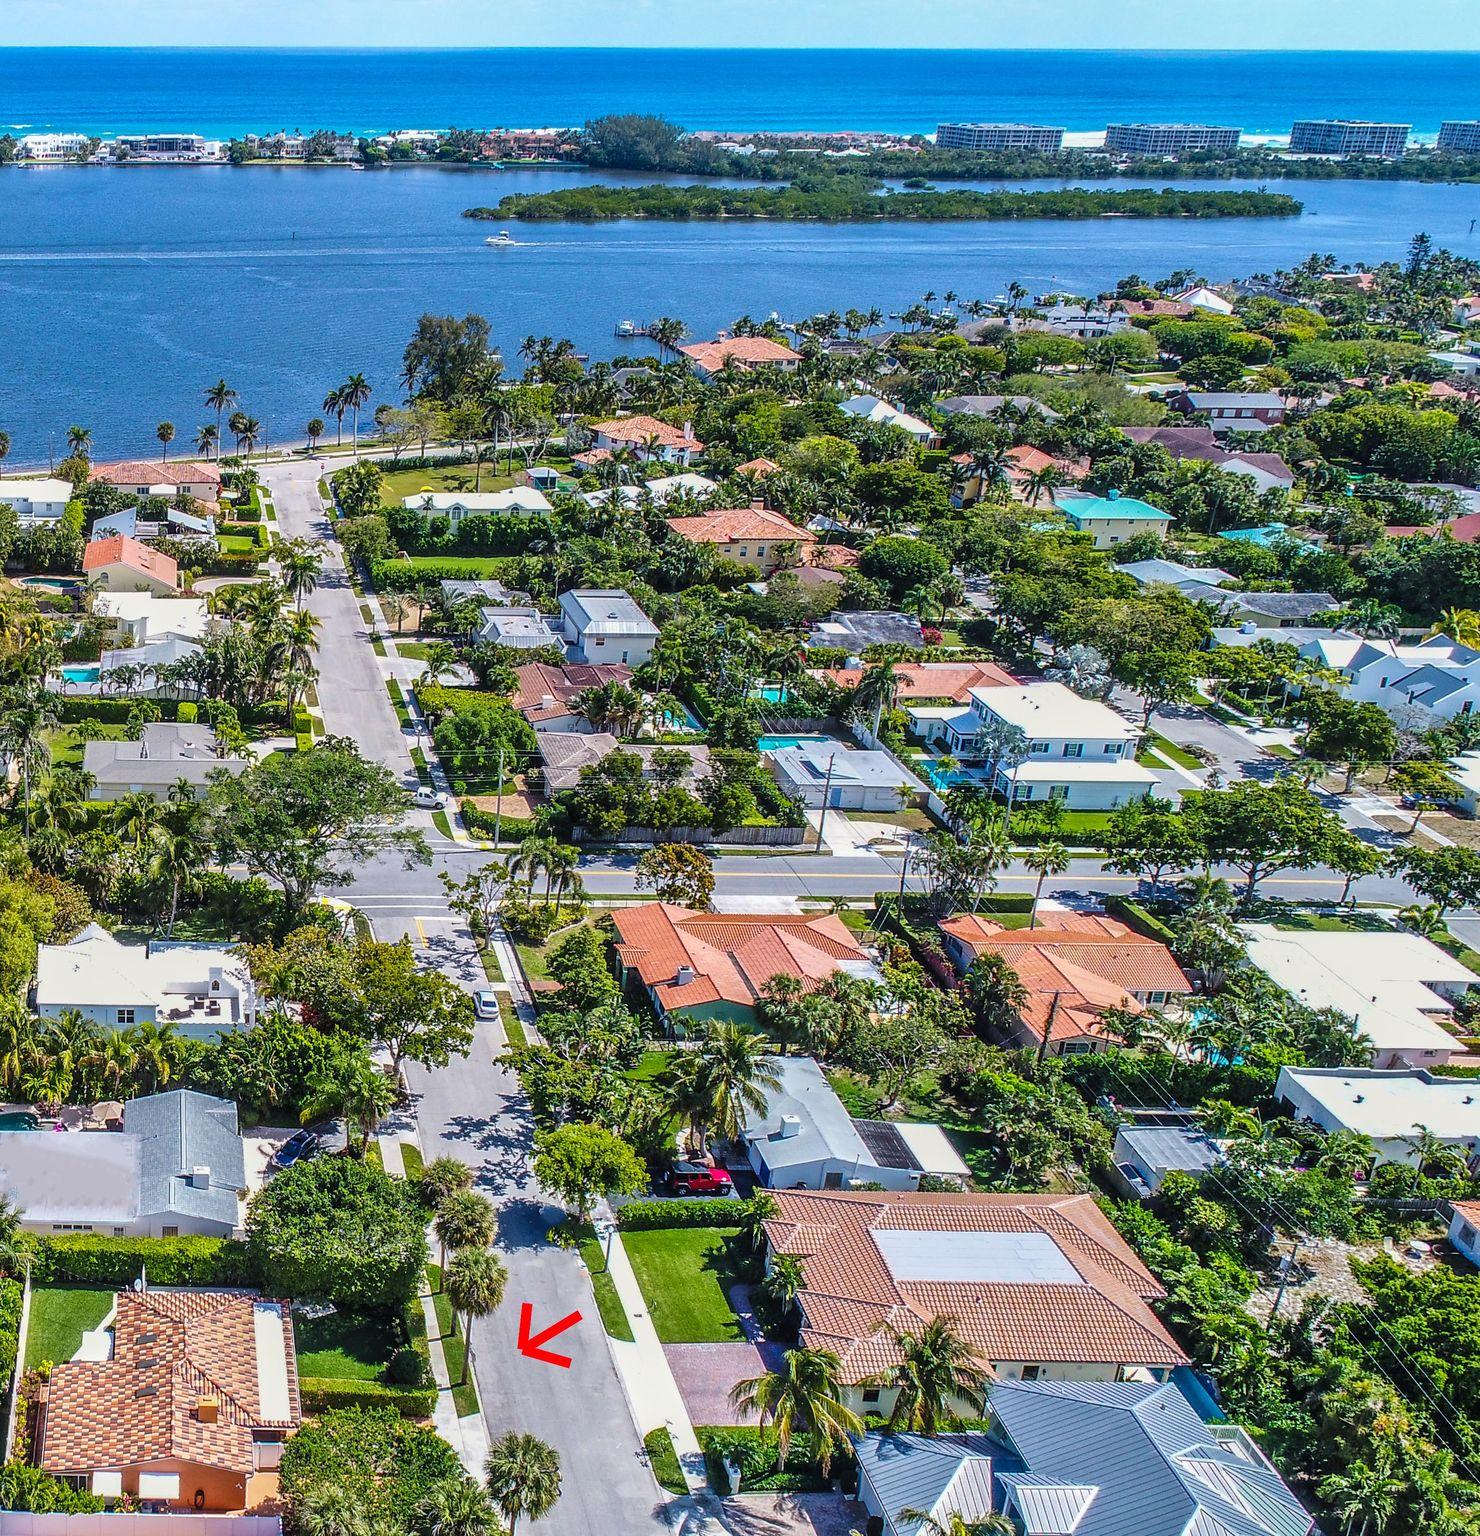 215 Summa St For Sale - West Palm Beach, FL | Trulia